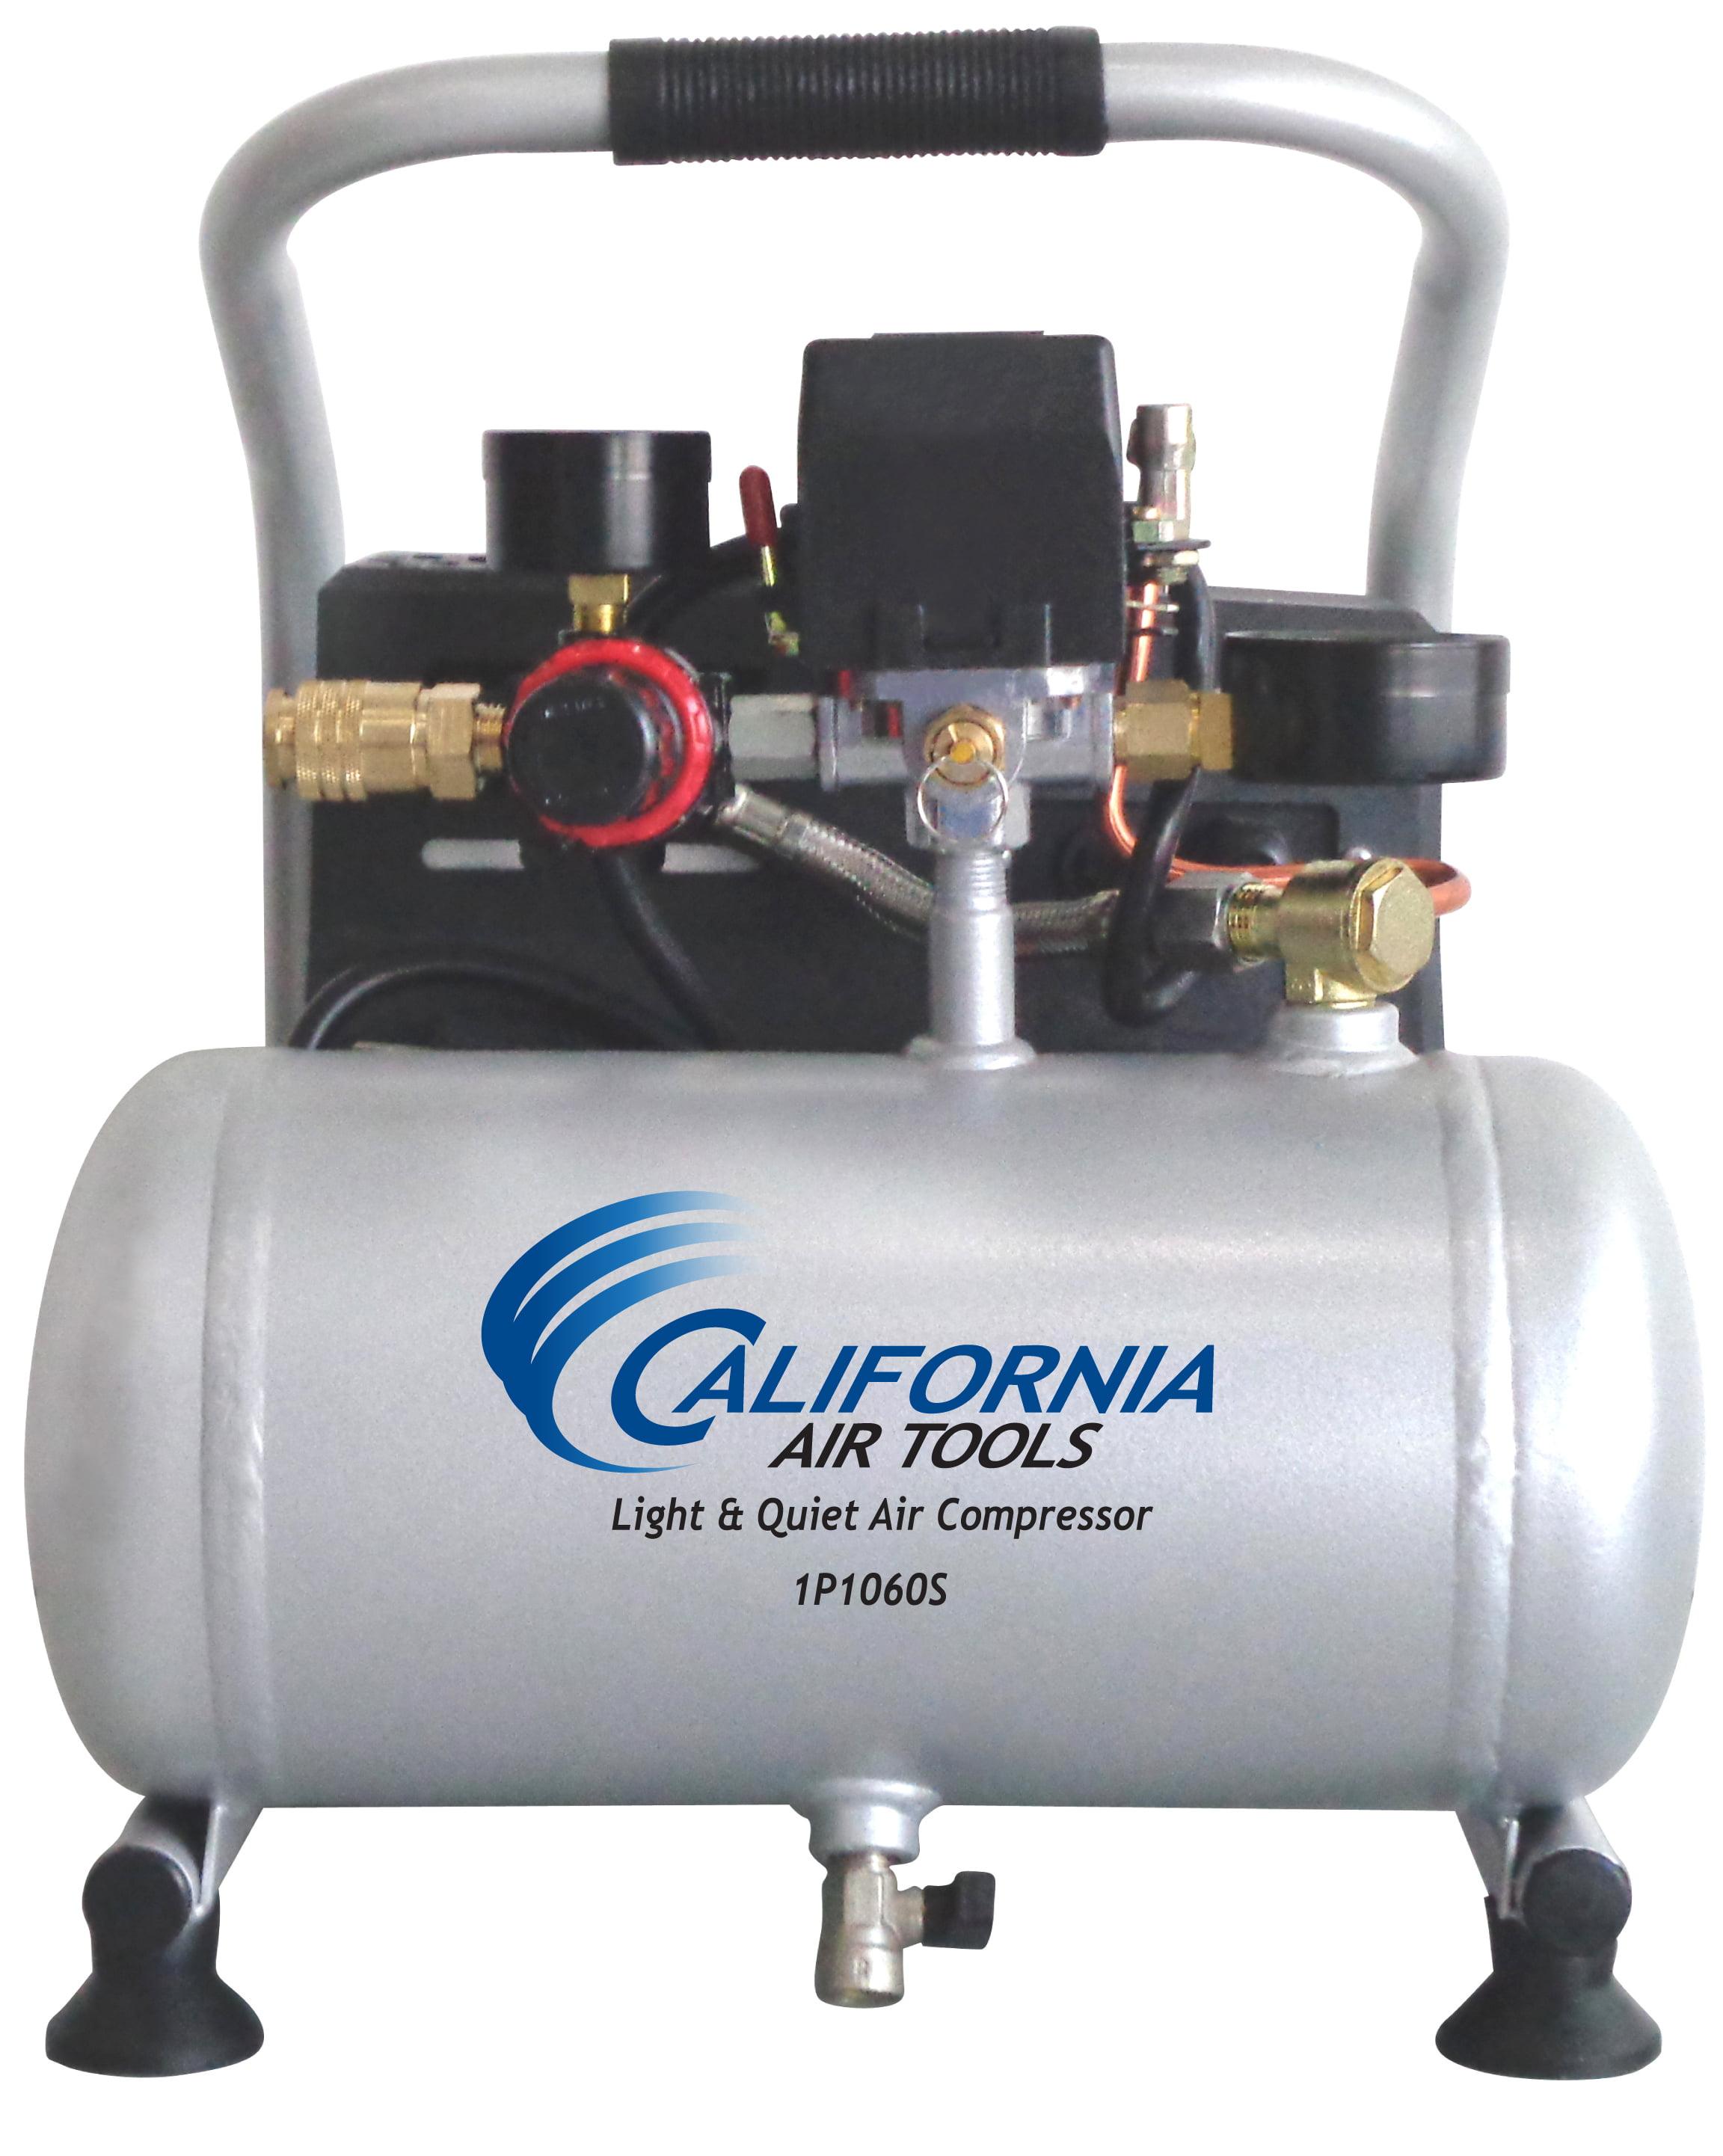 California Air Tools 1P1060S Light & Quiet Air Compressor by California Air Tools